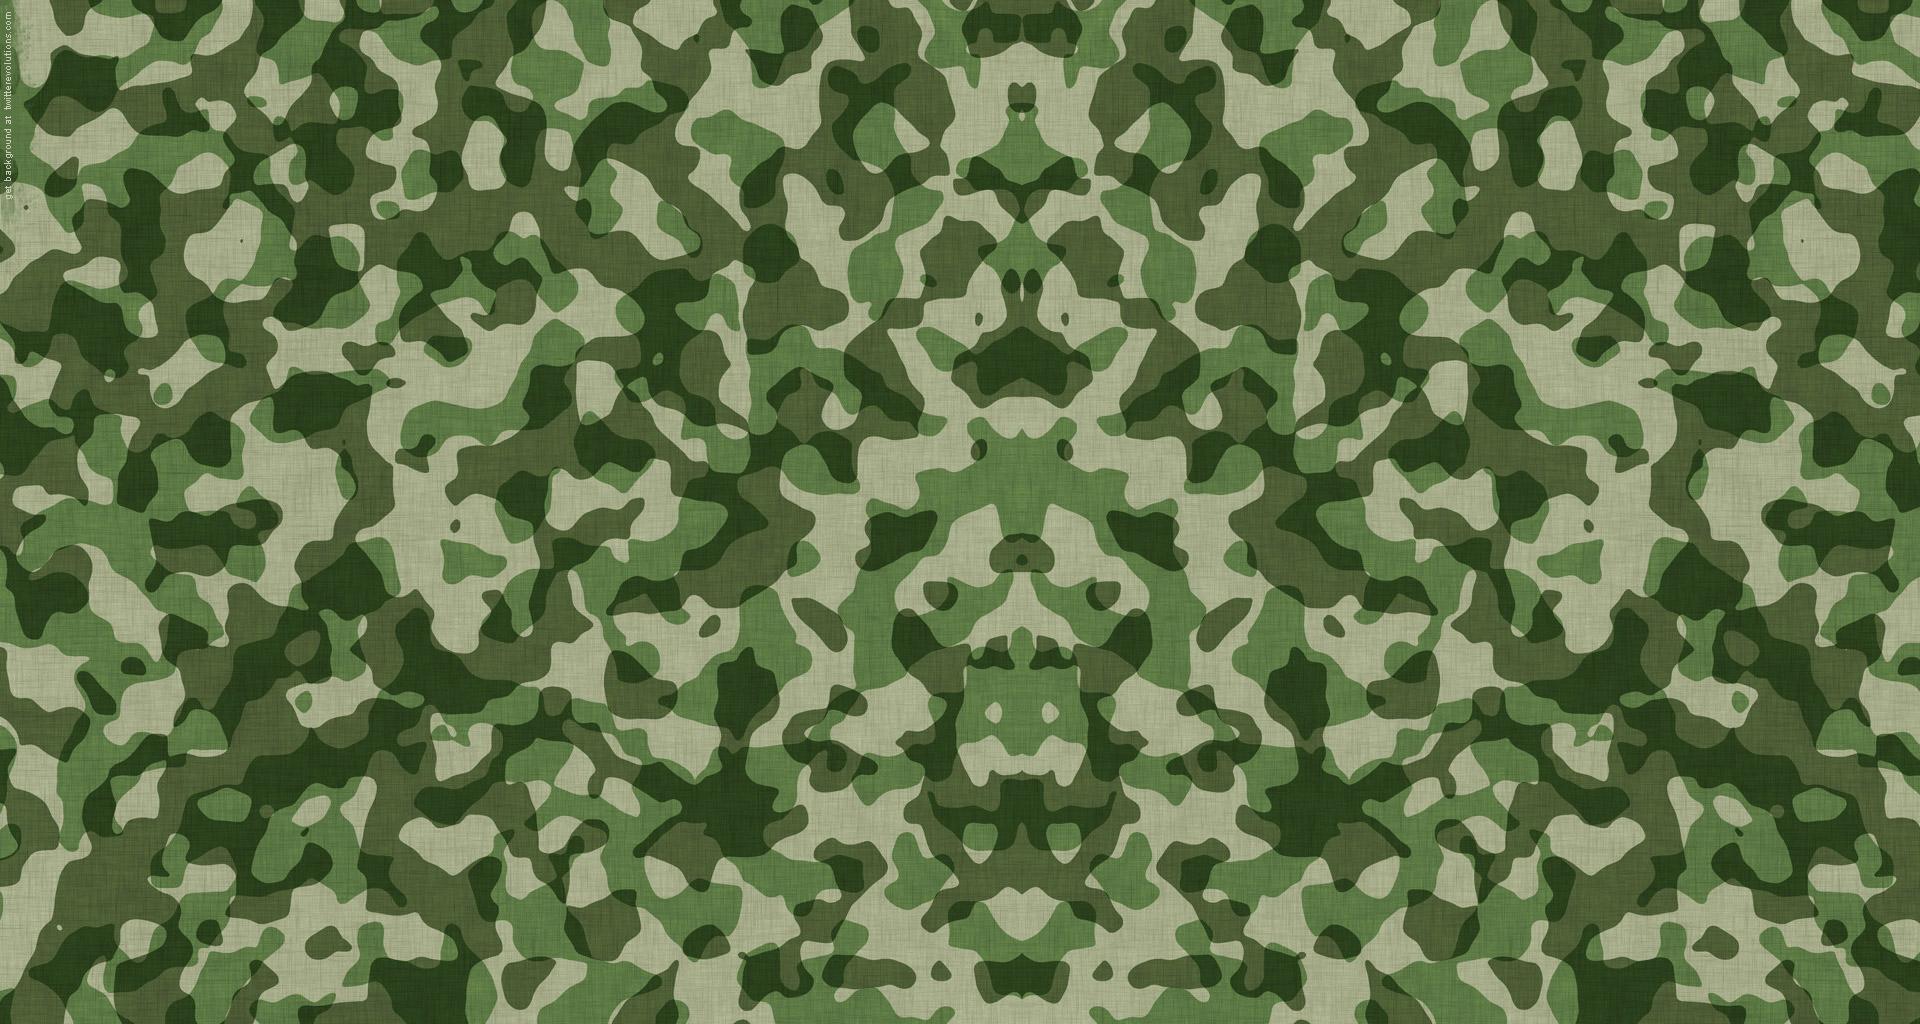 Hd Fall Wallpapers Phone Camo Hd Wallpapers Pixelstalk Net